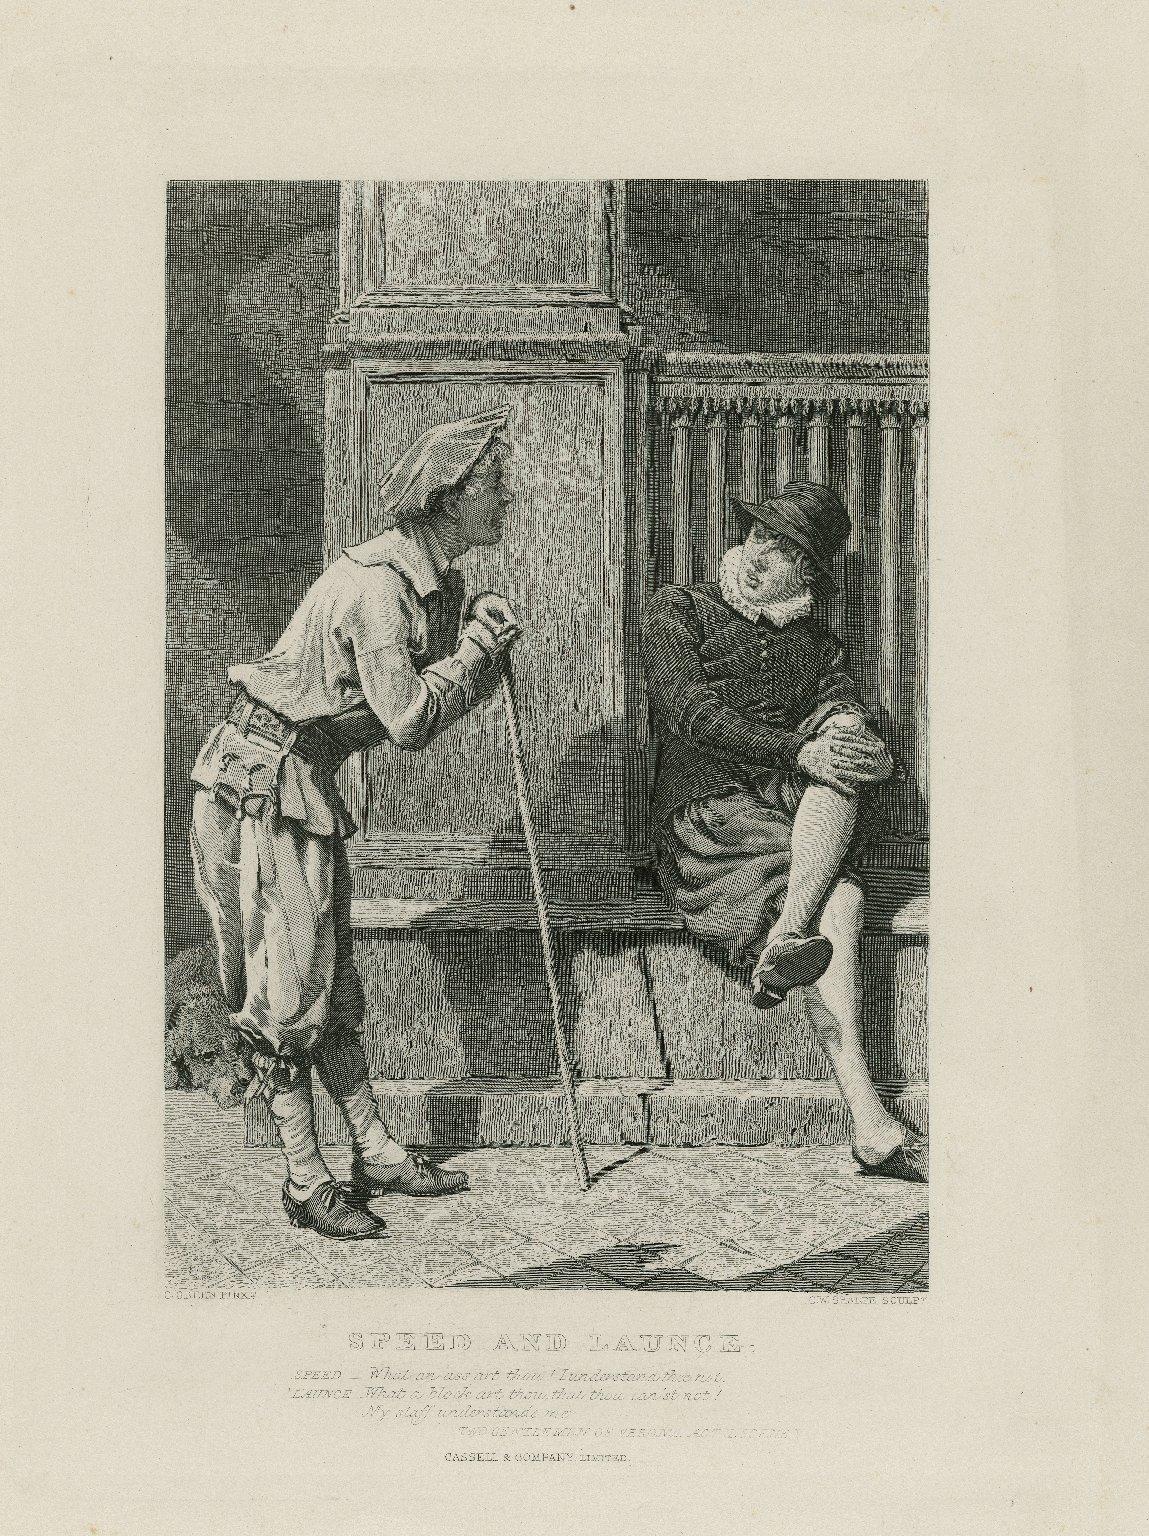 Speed and Launce : Speed -- What an ass art thou ... Two gentlemen of Verona, act II, scene V [graphic] / C. Green Pinxt. ; C.W. Sharpe Sculpt.